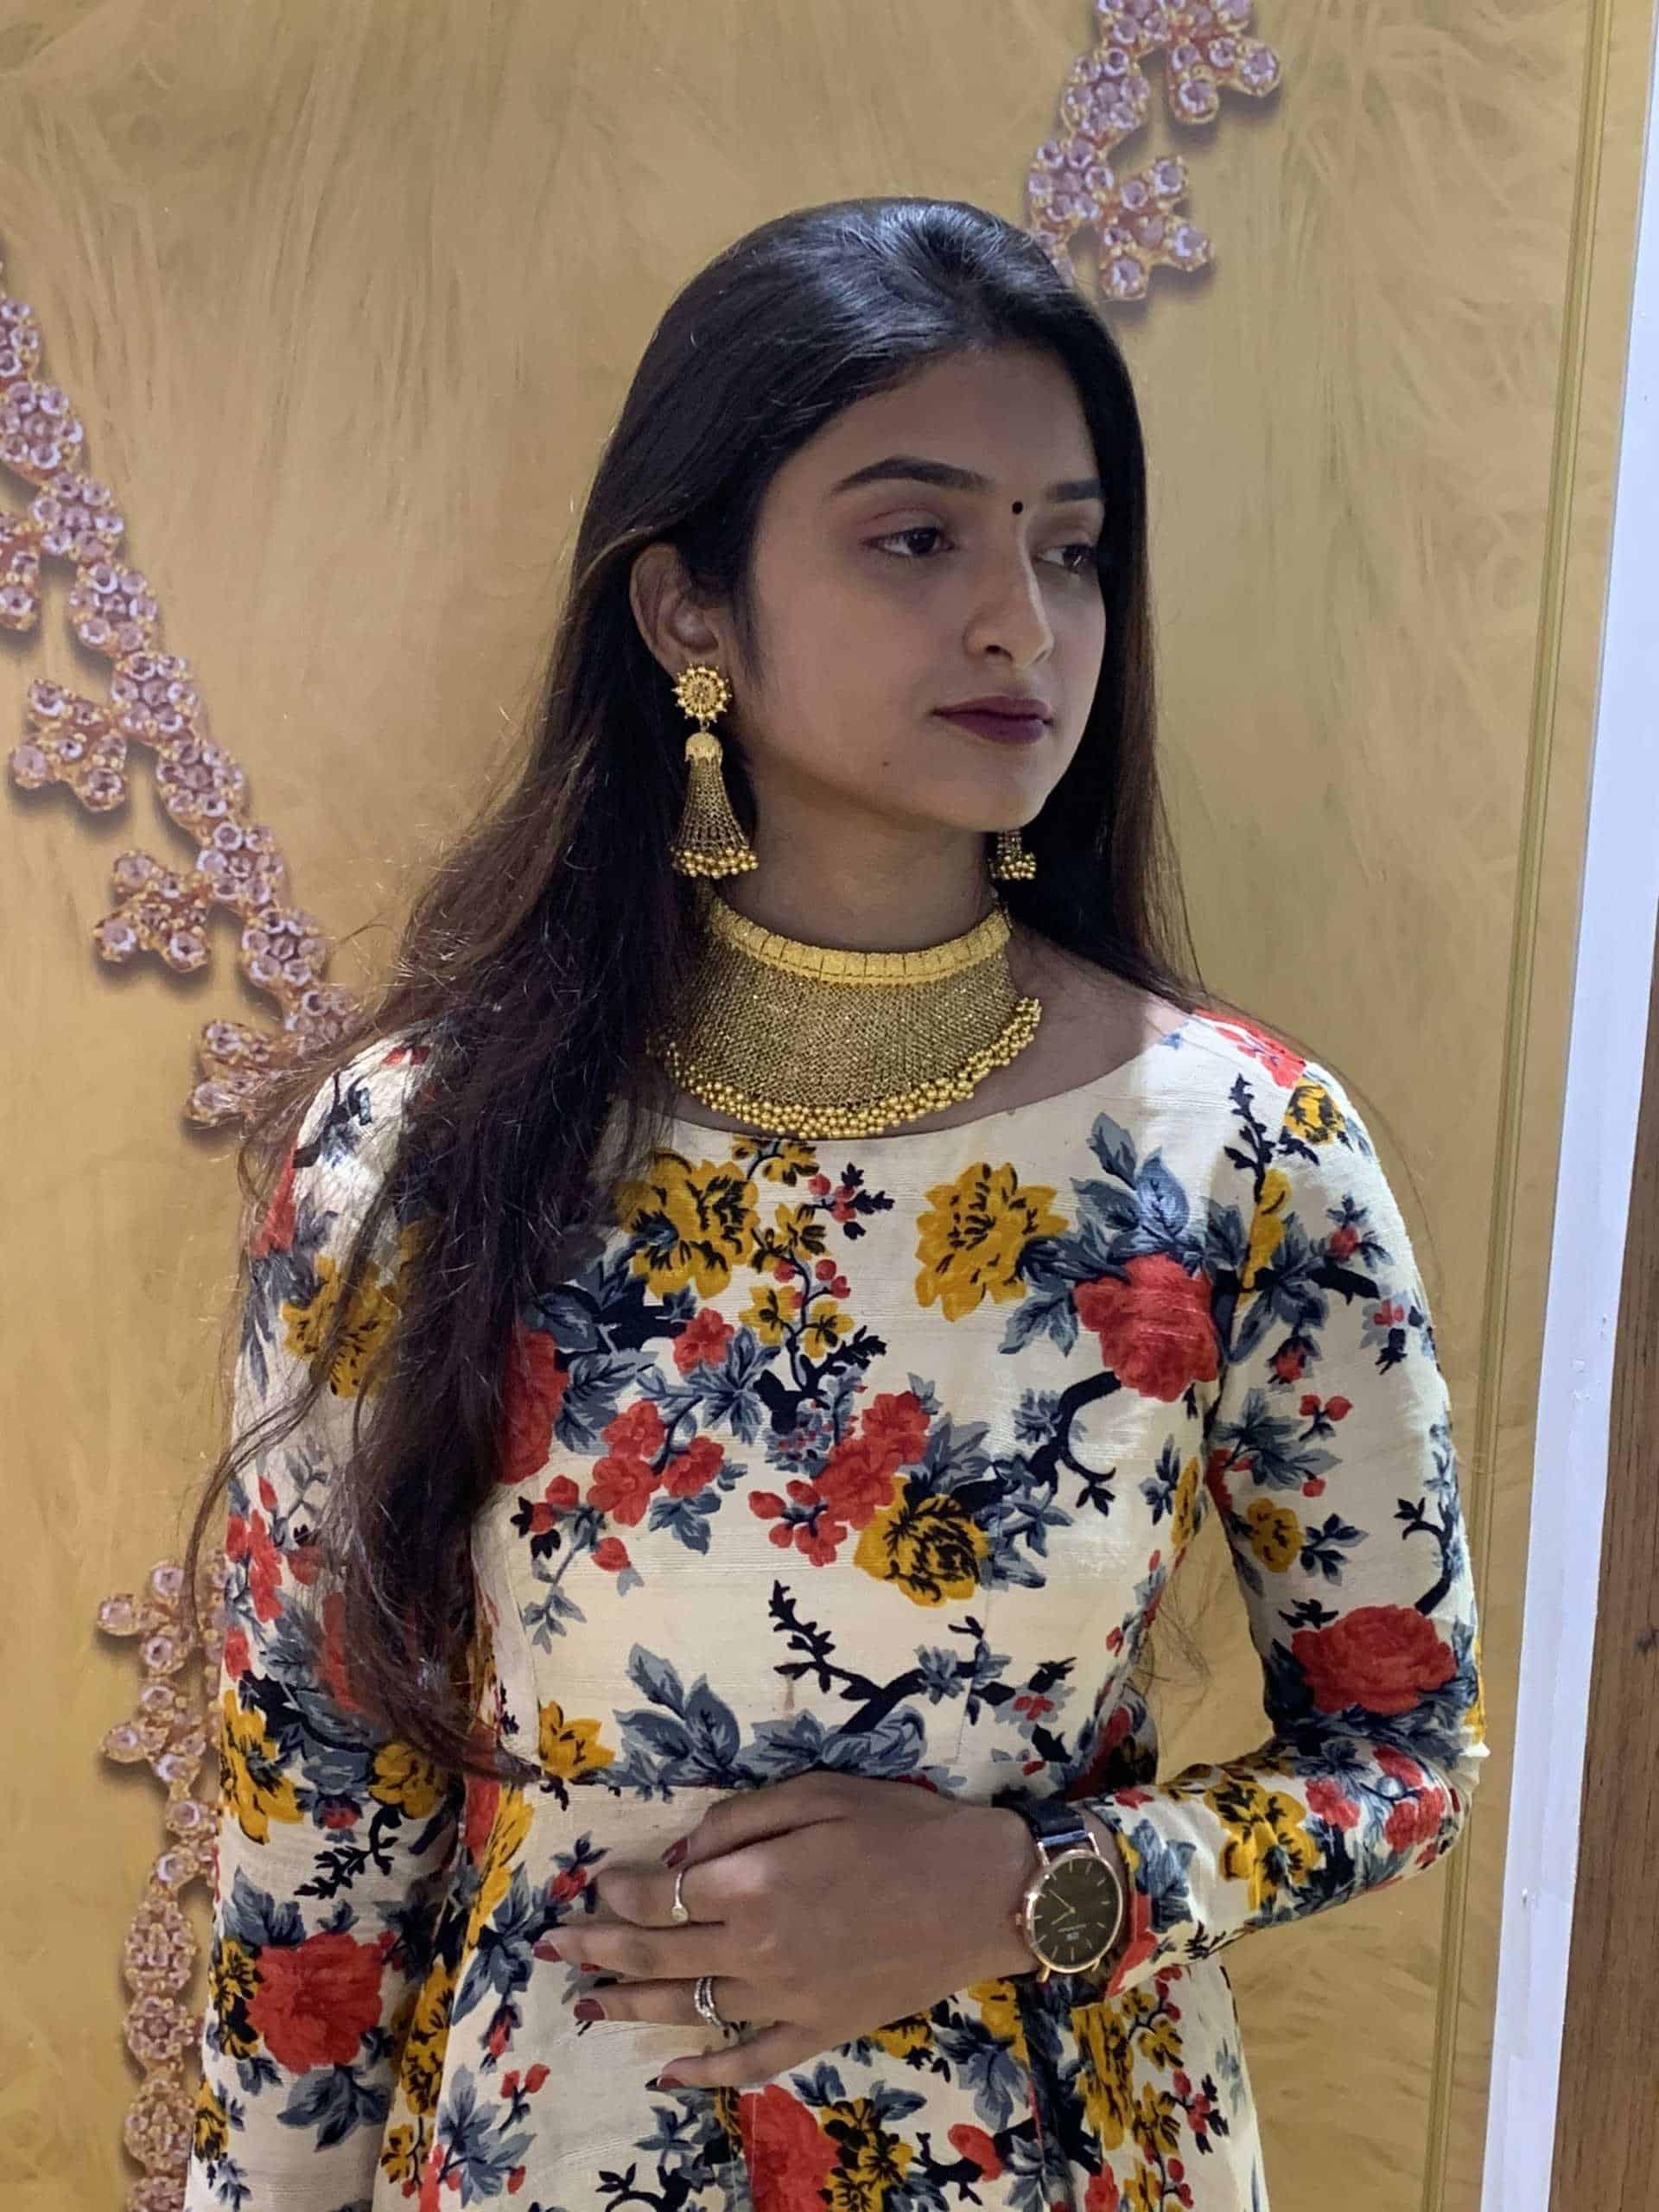 Indian model Mumbai show February 2020